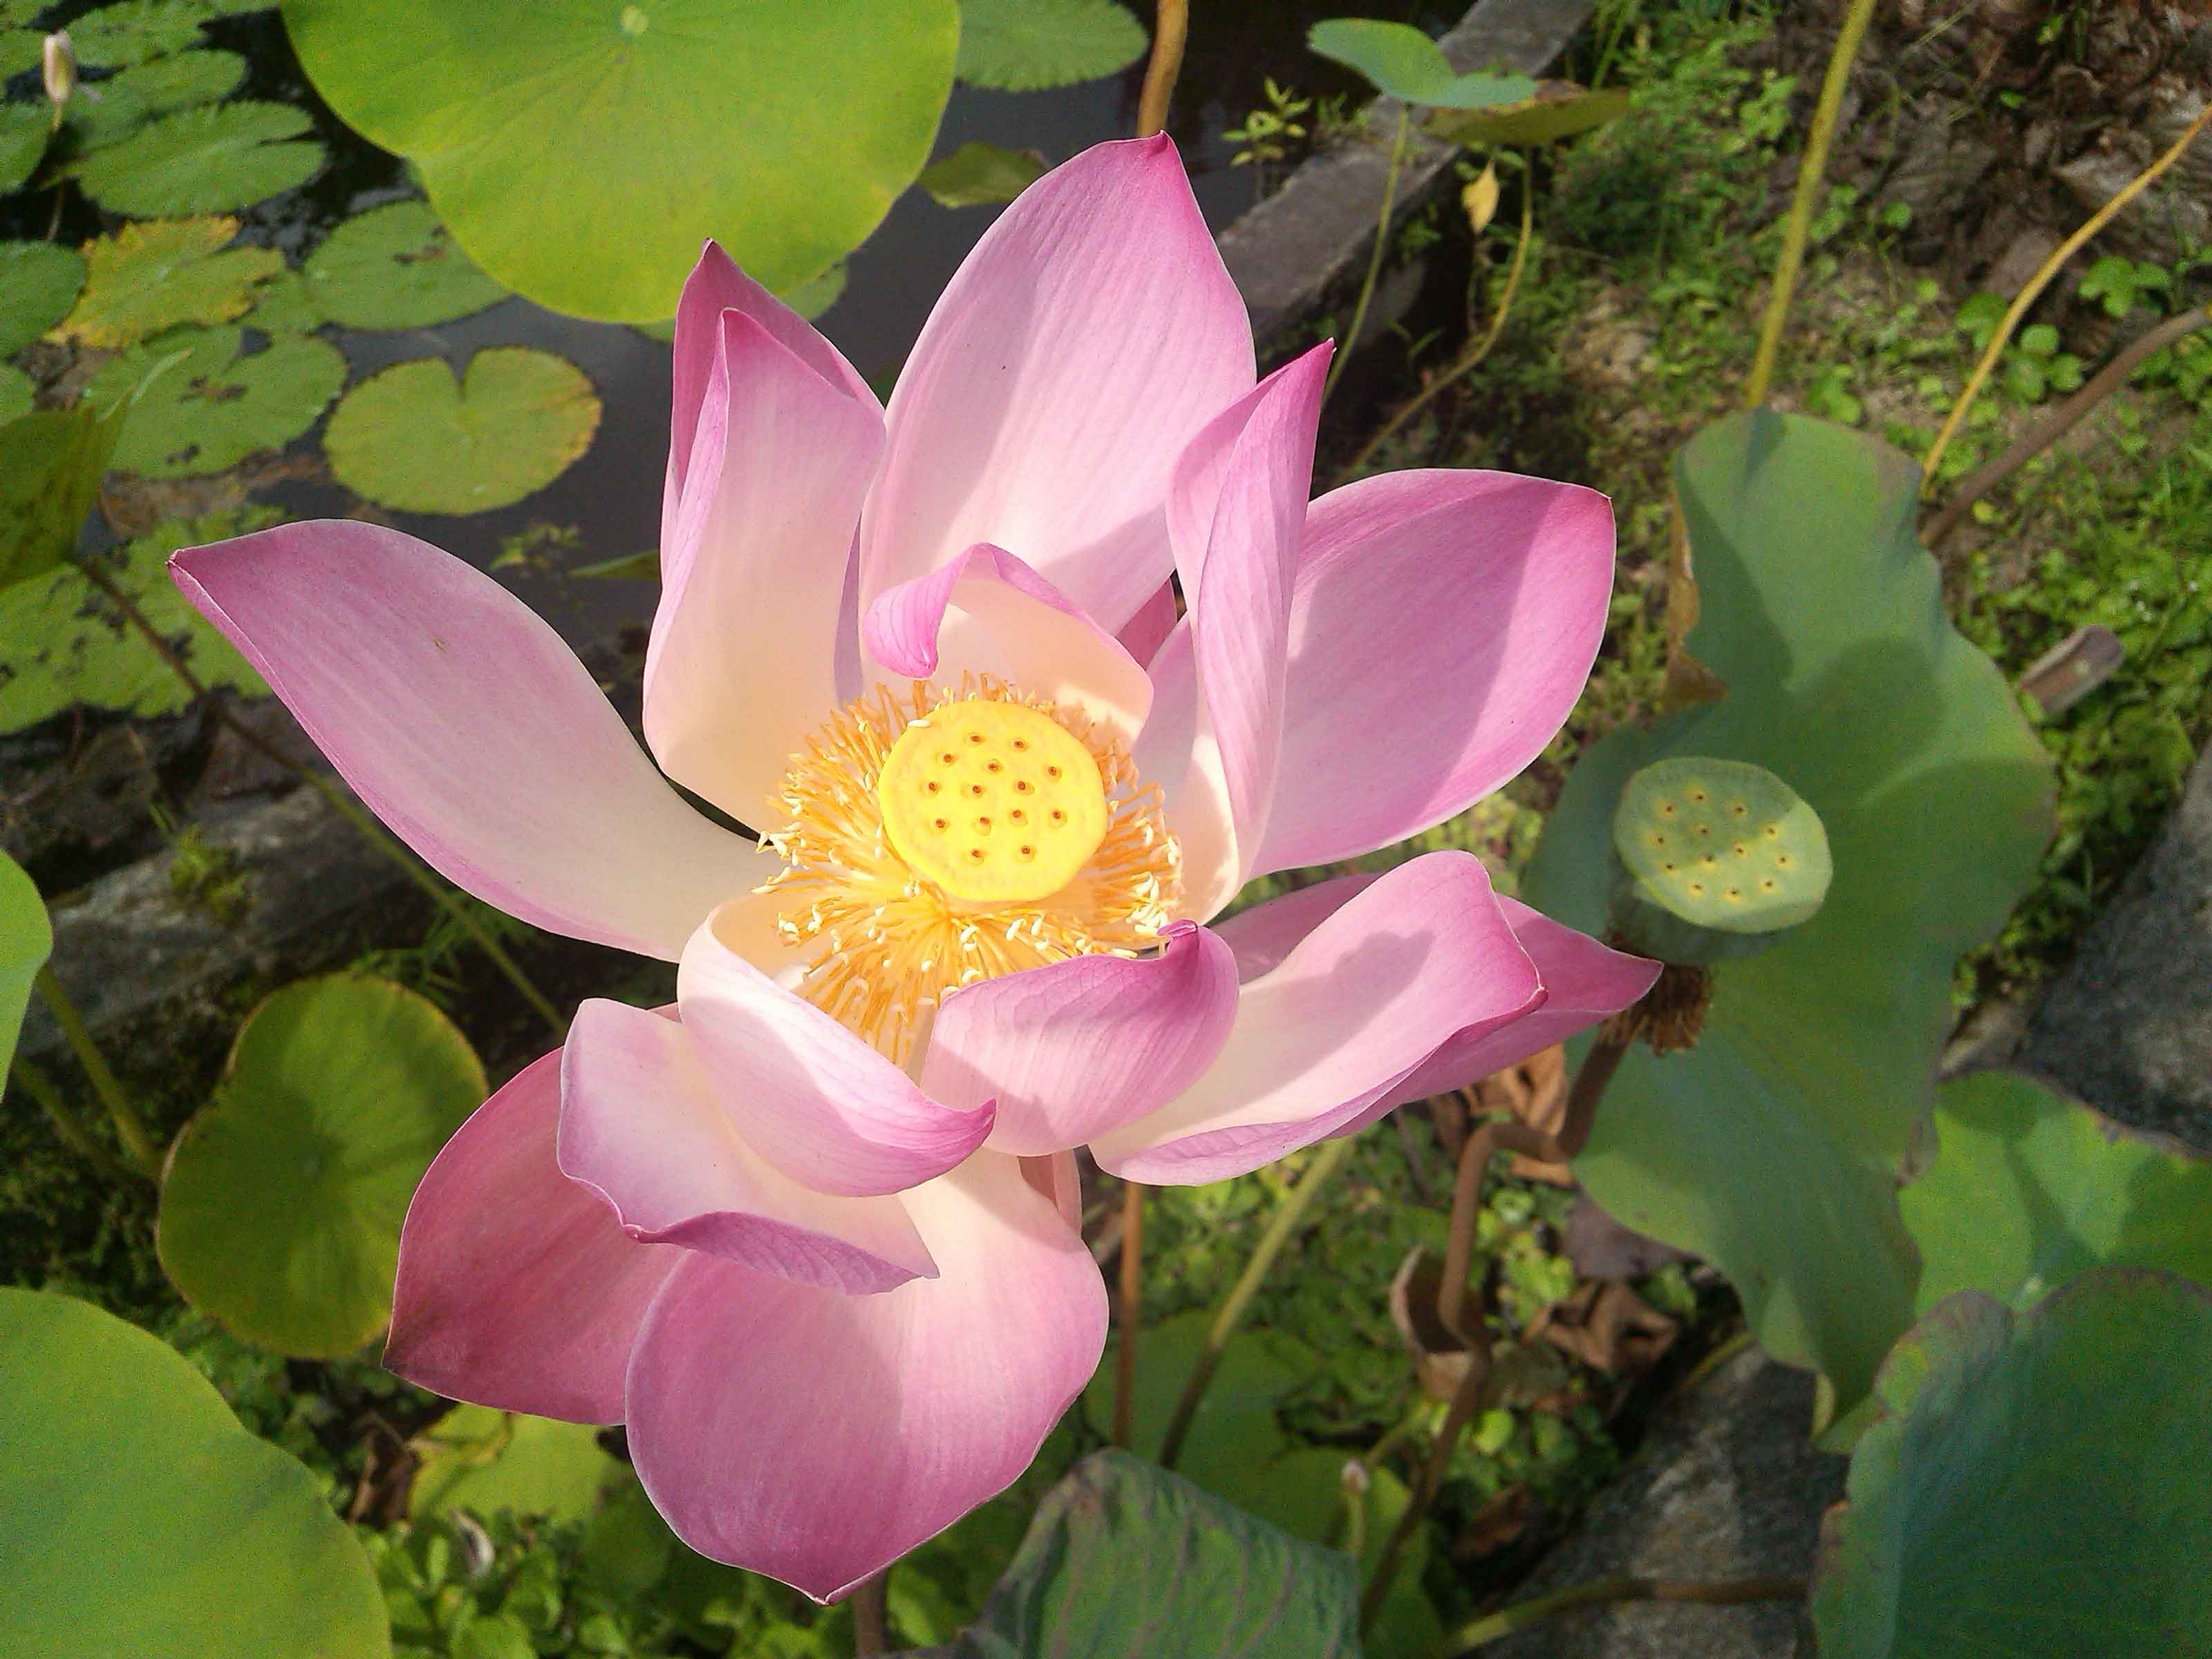 tirta-gangga-lotus-flower-holy-bath-amed-balidiversity